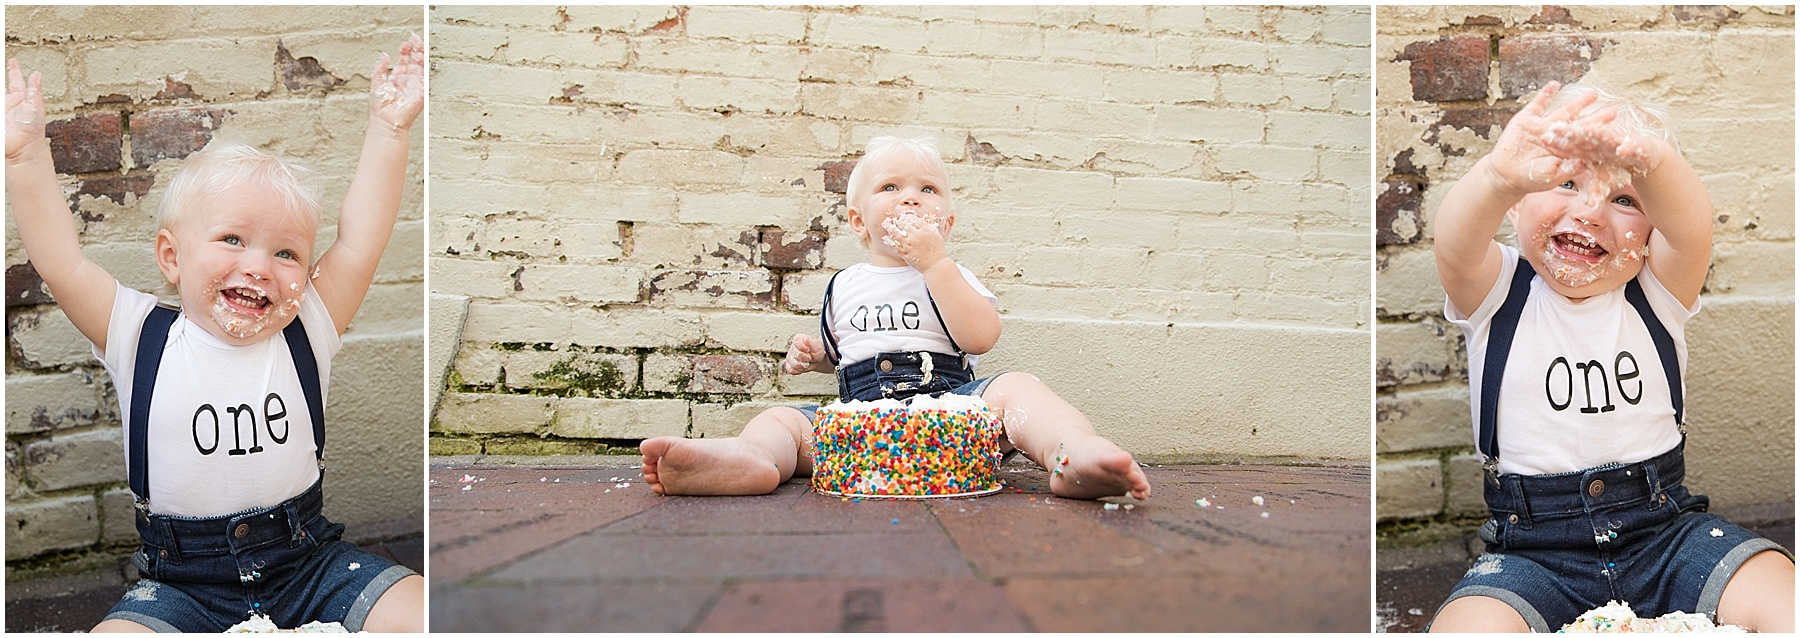 One year old boy with sprinkle smash cake, Columbus Family Photography, Raindancer Studios